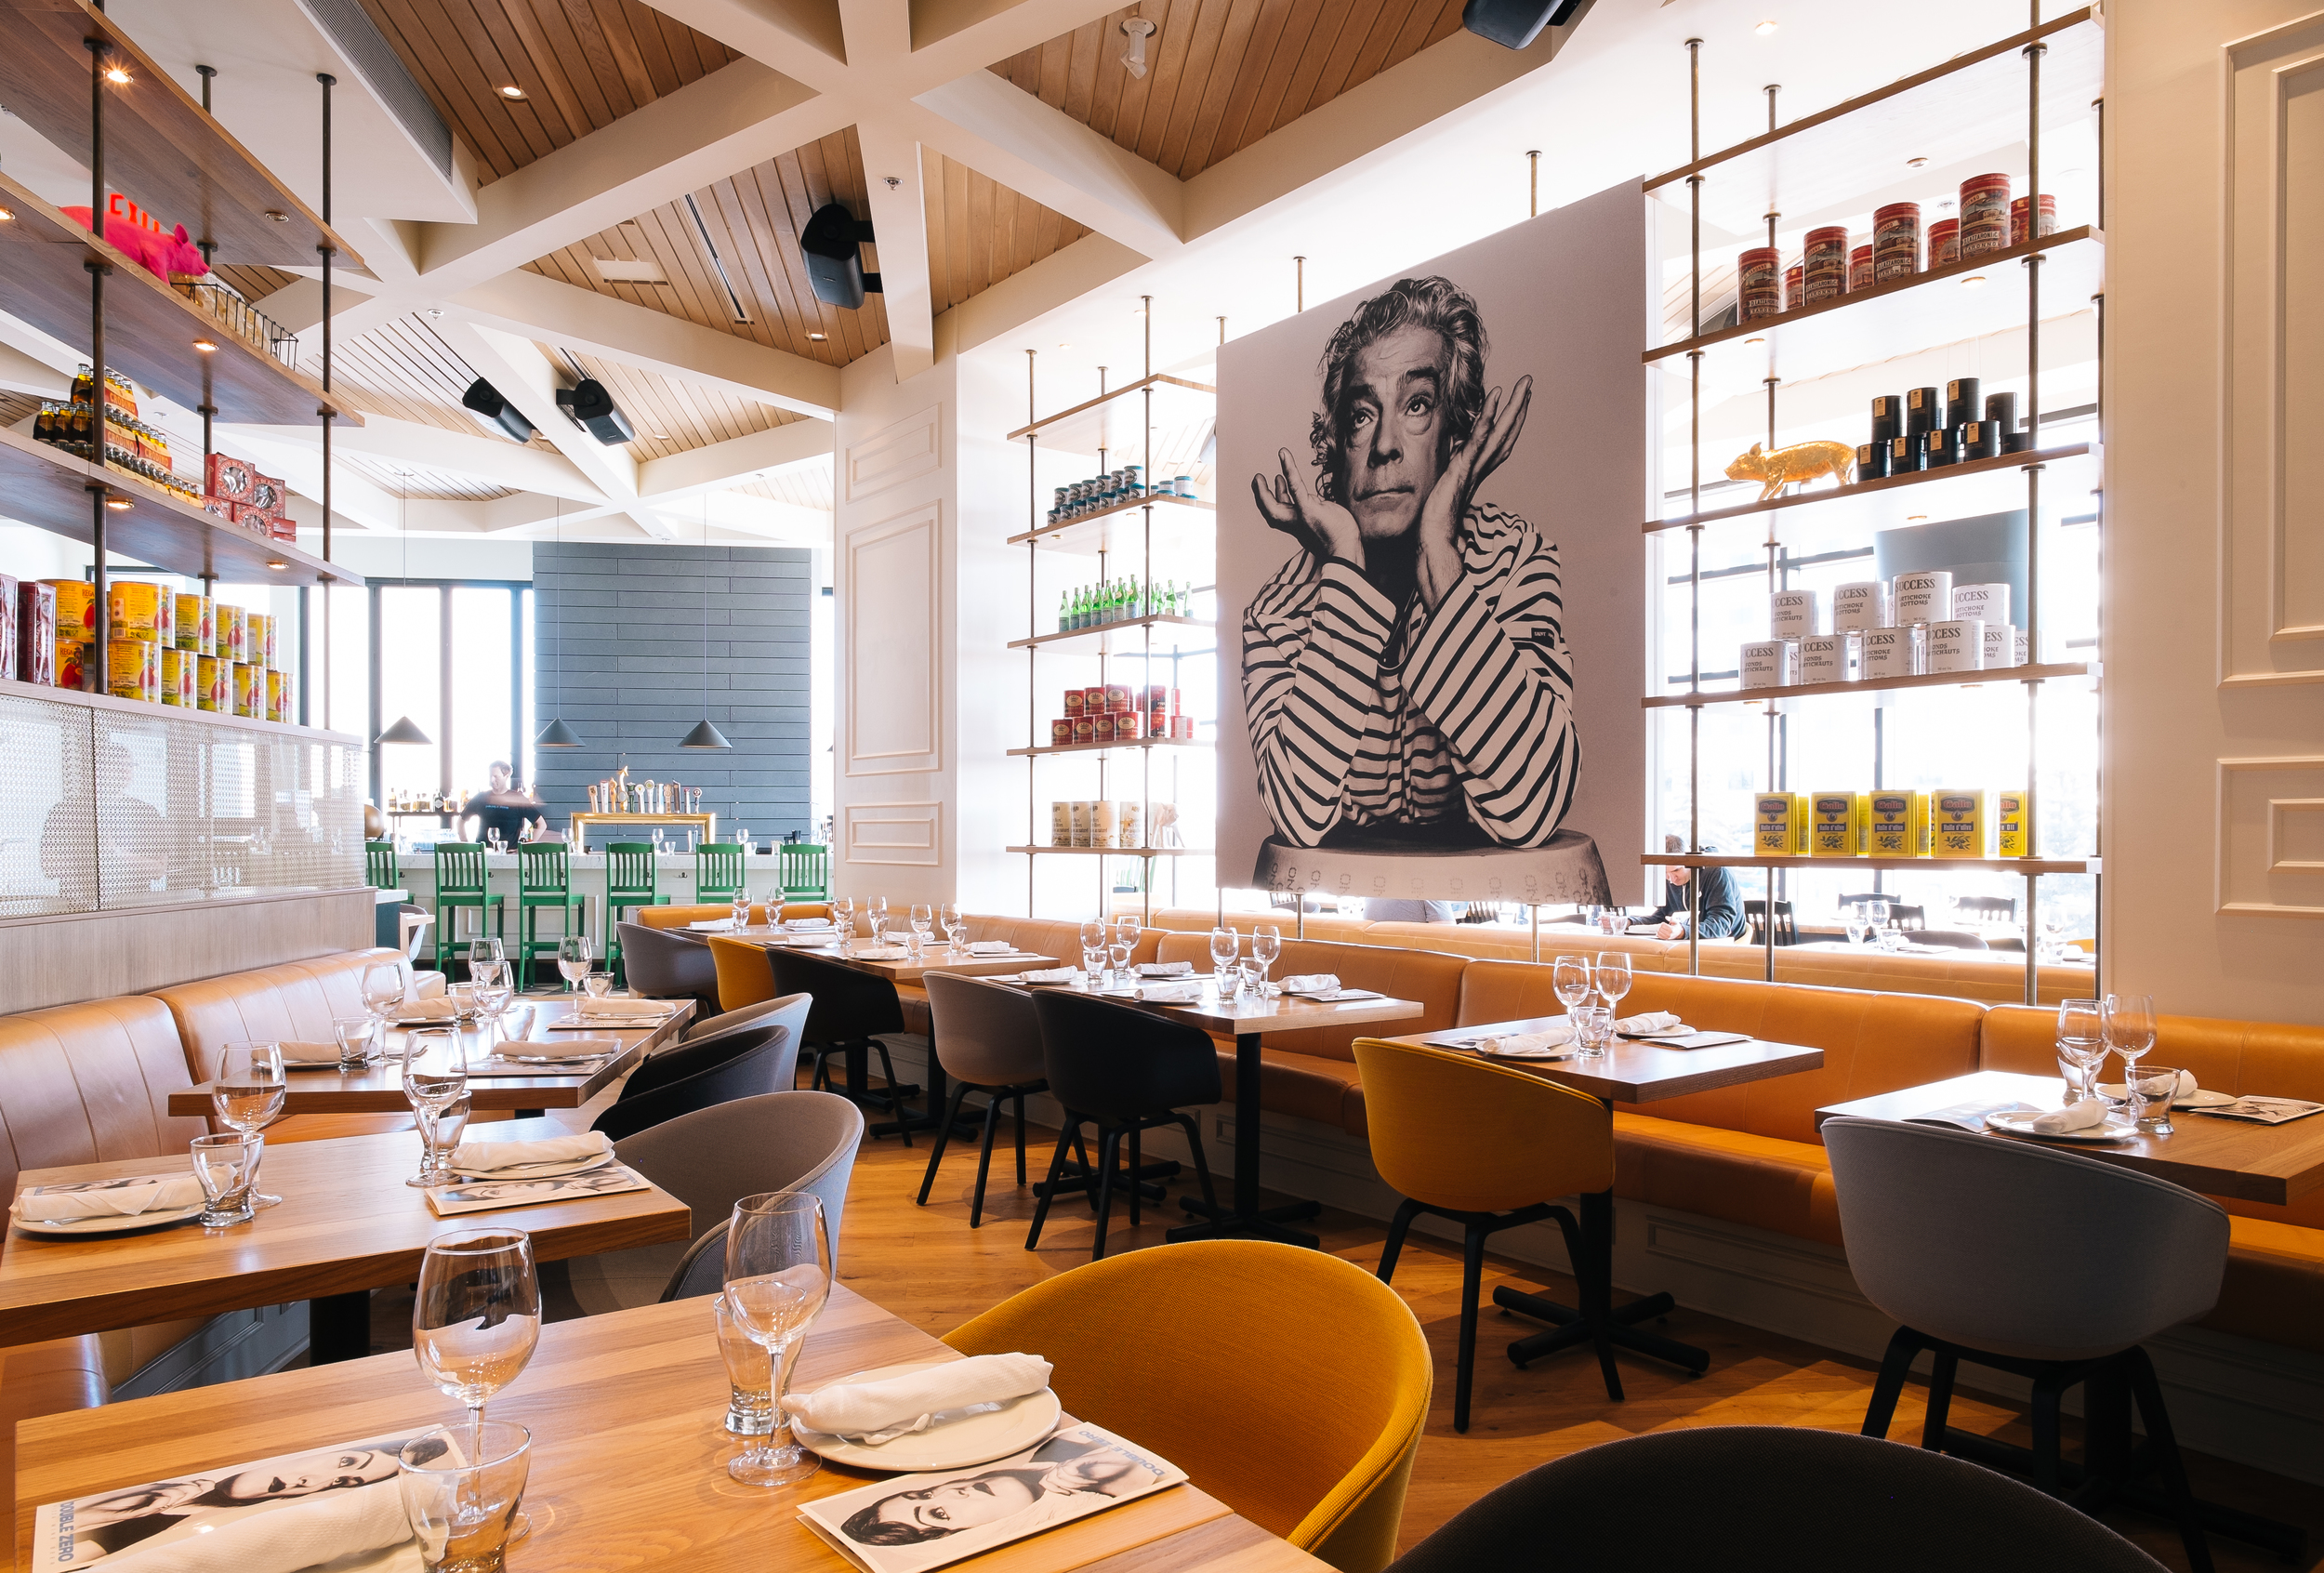 Ristorante – West Dining